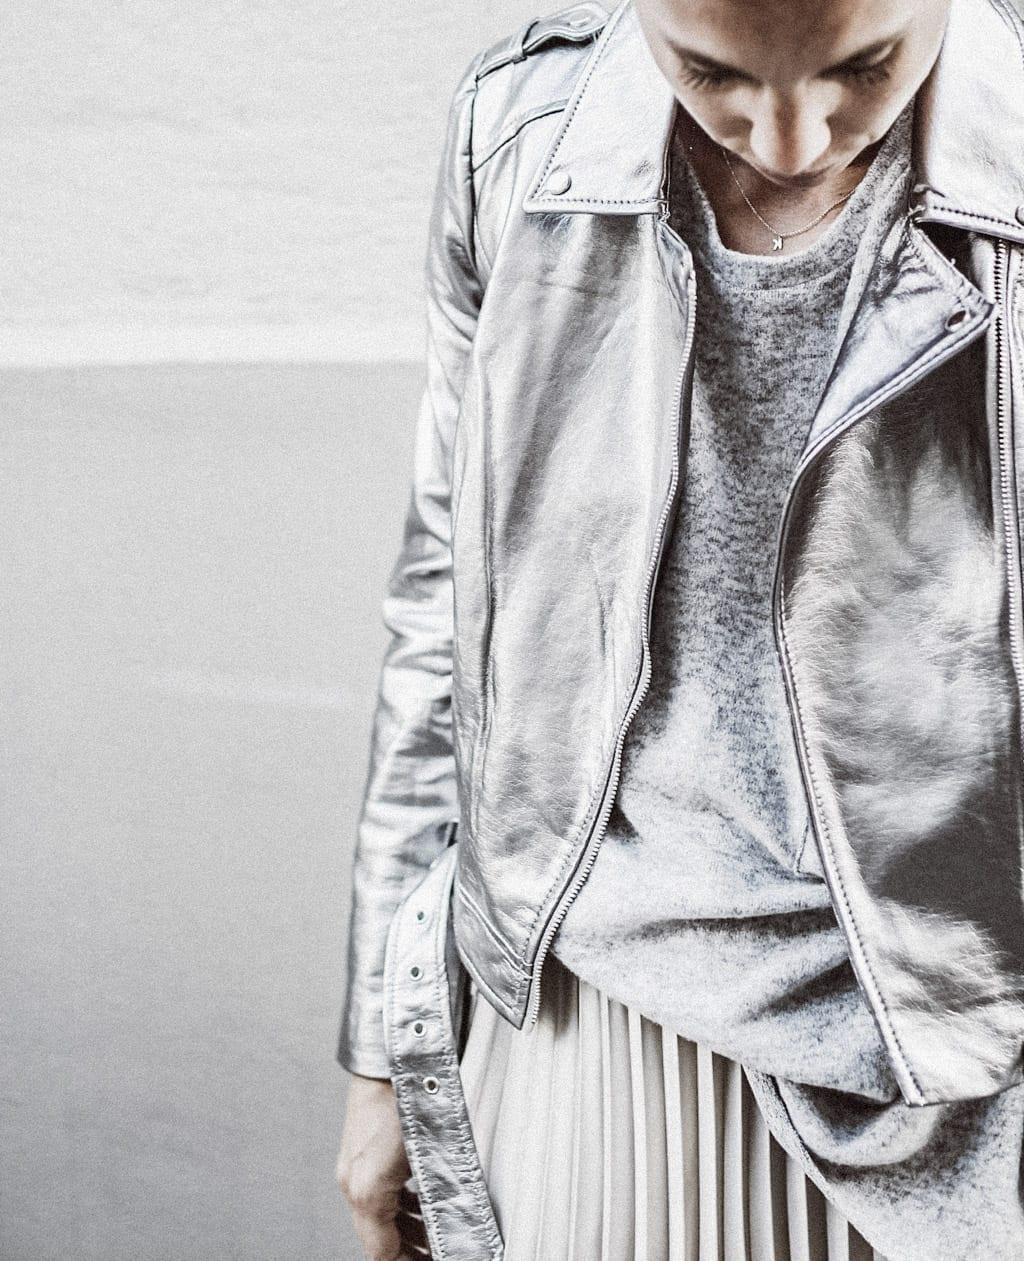 ck-constantlyk-com-karin-kaswurm-street-style-fashion-silver-leather-jacket-plissee-6961